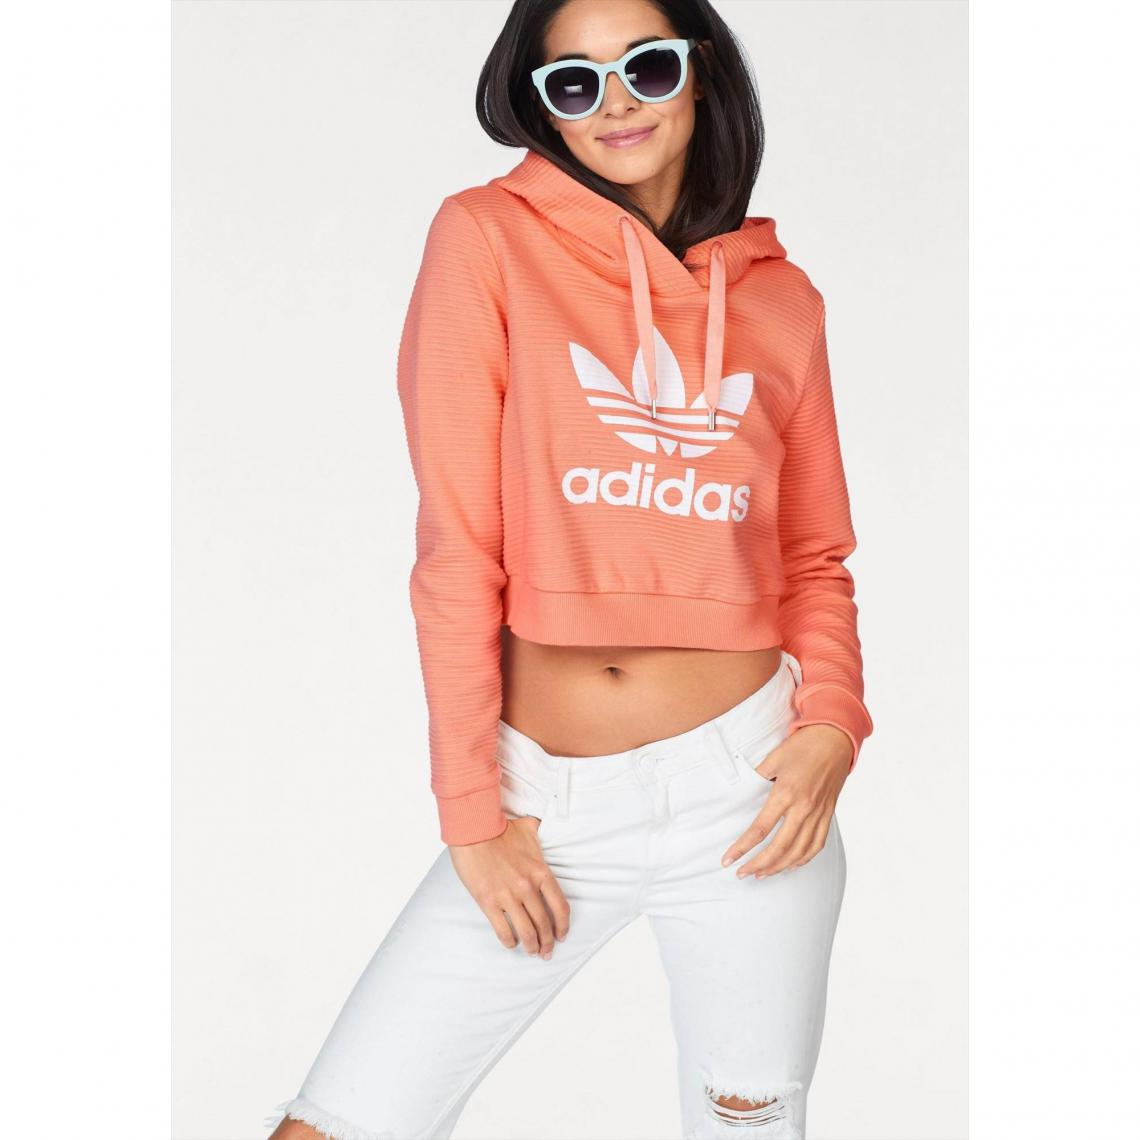 b1dba47033d Sweat à capuche femme adidas Originals - Corail Adidas Originals Femme